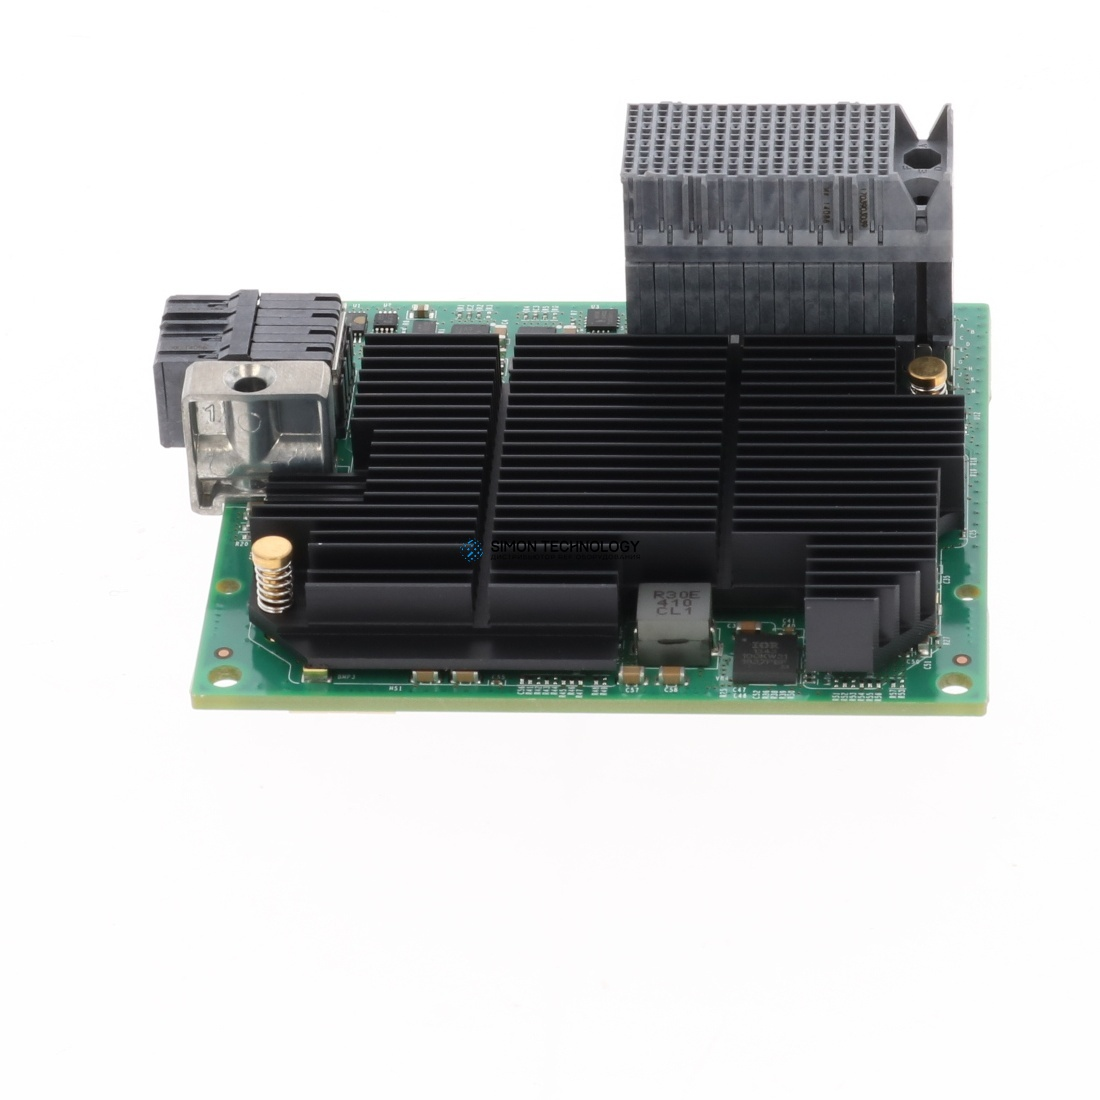 IBM Flex System 4-port 16Gb FC Adapter (FC5054)